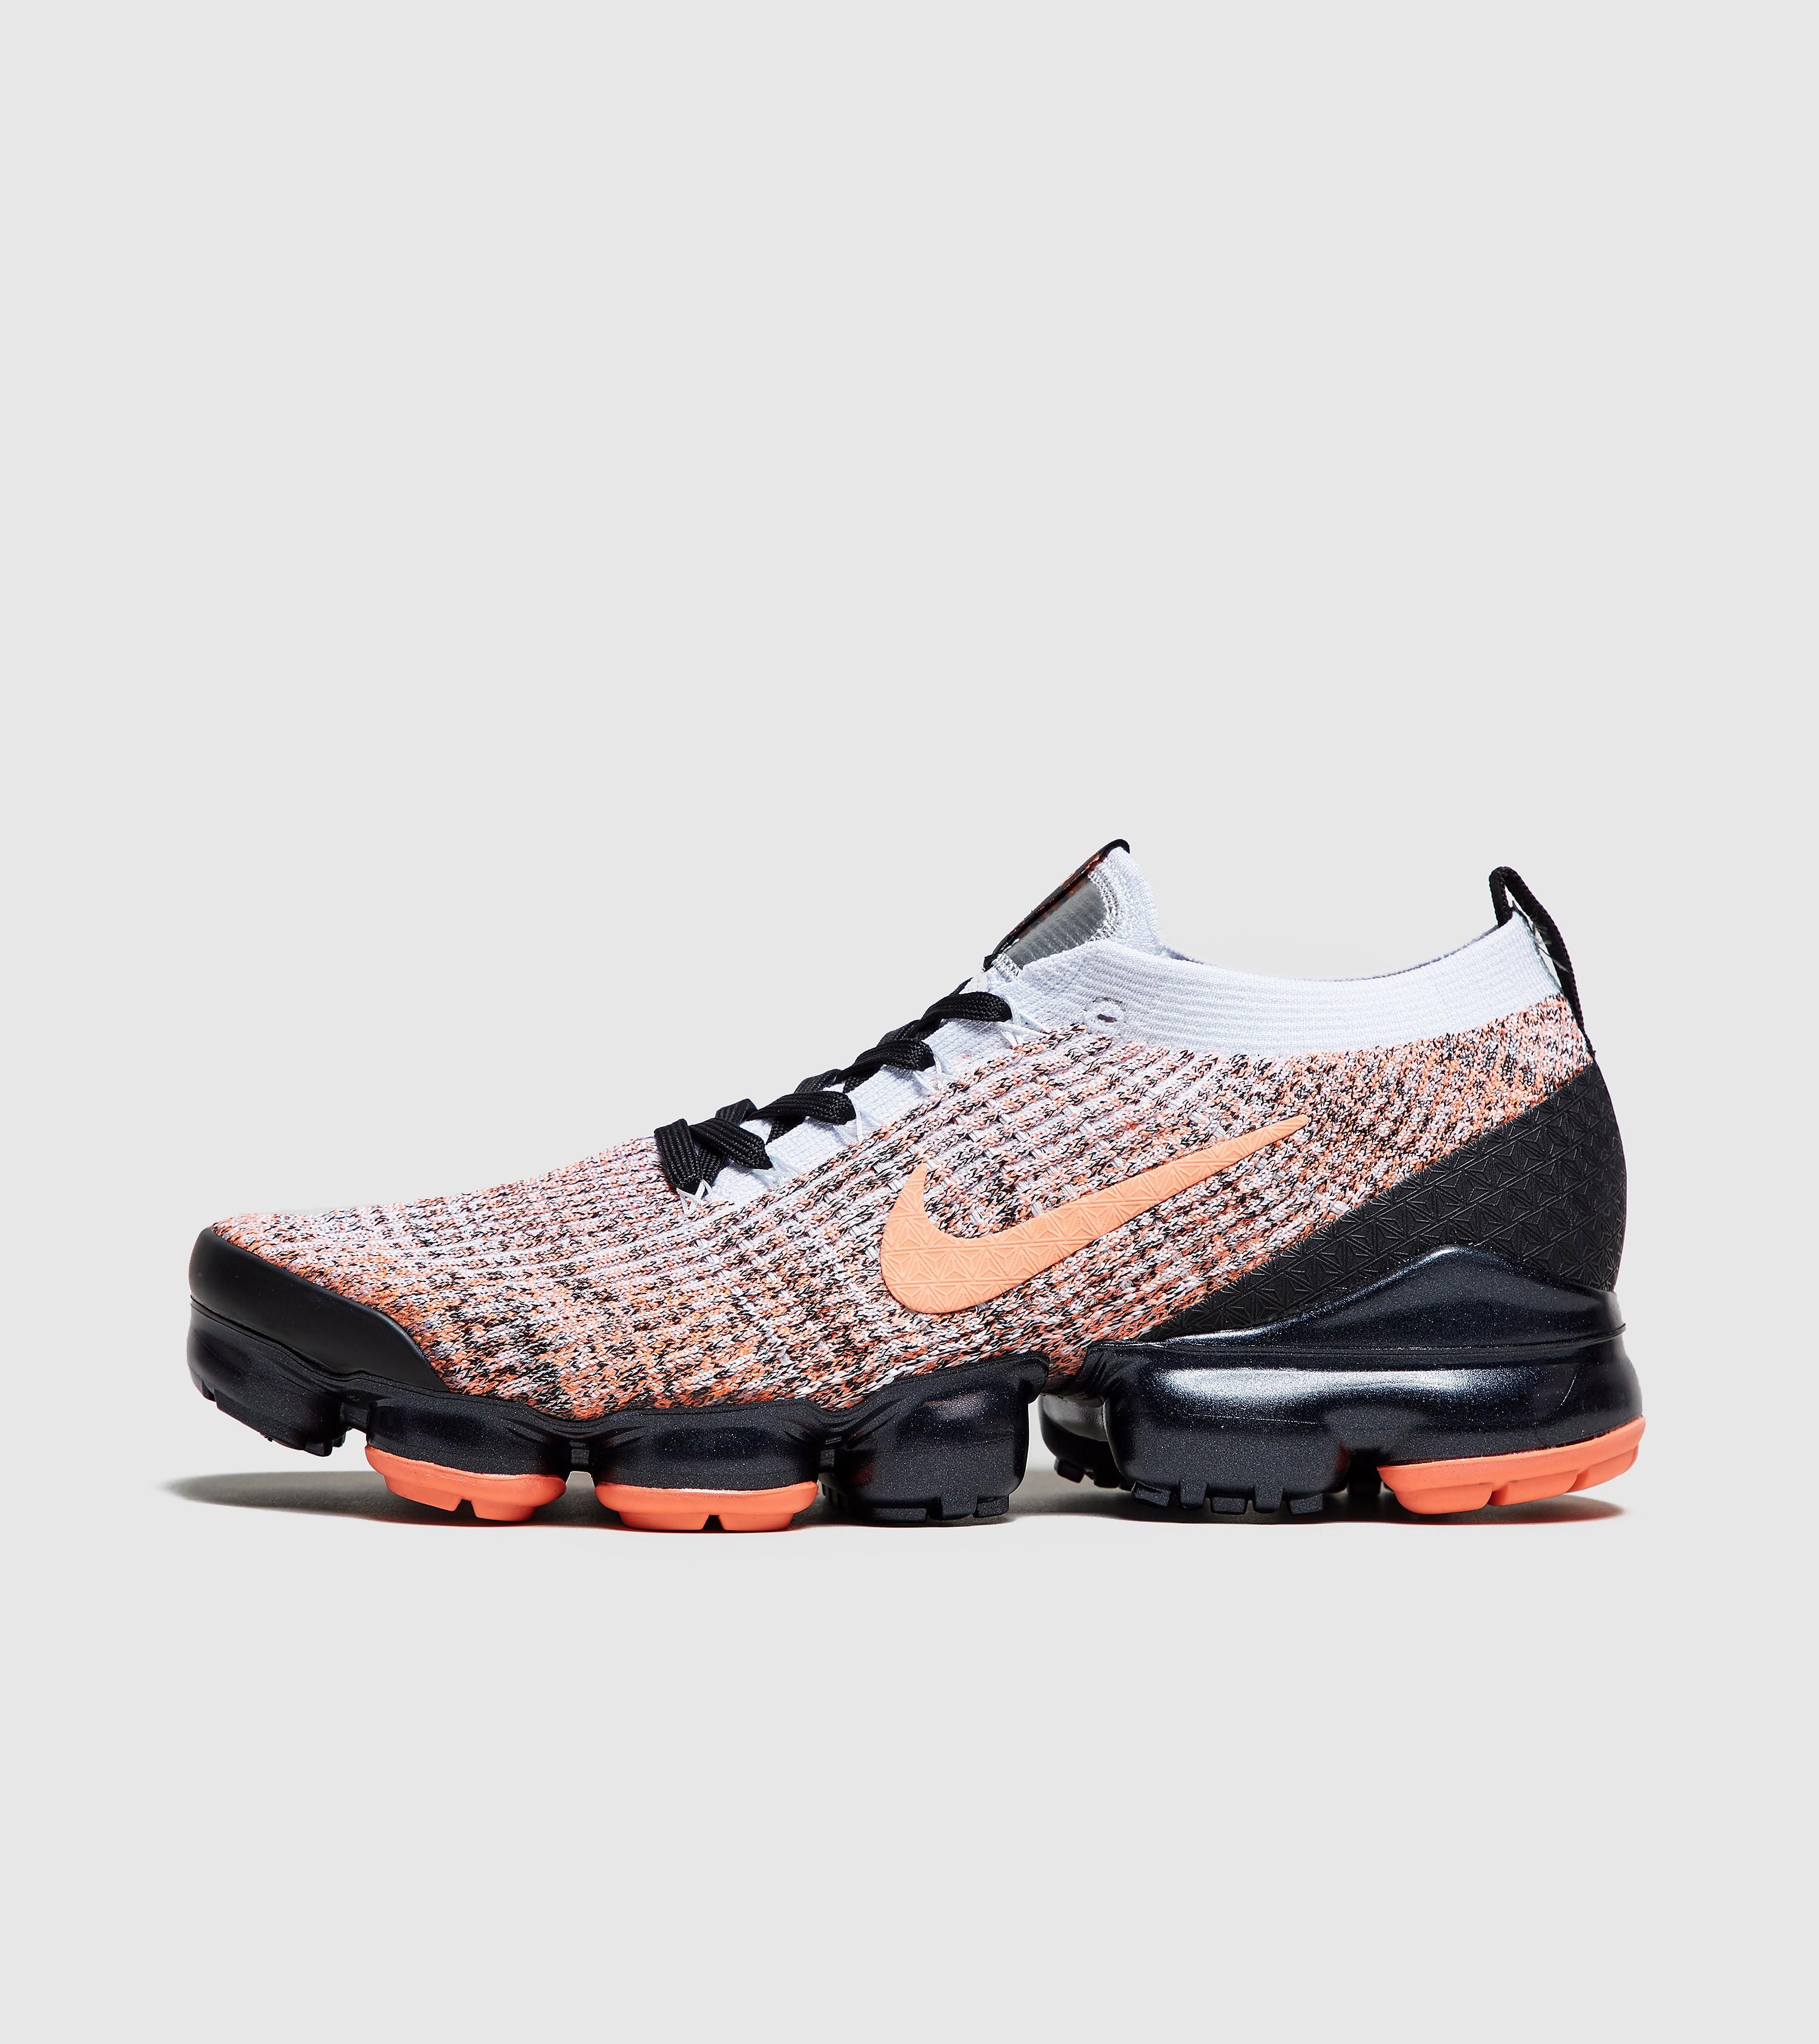 quality design e7a7c 6cbc2 Nike - London Trend